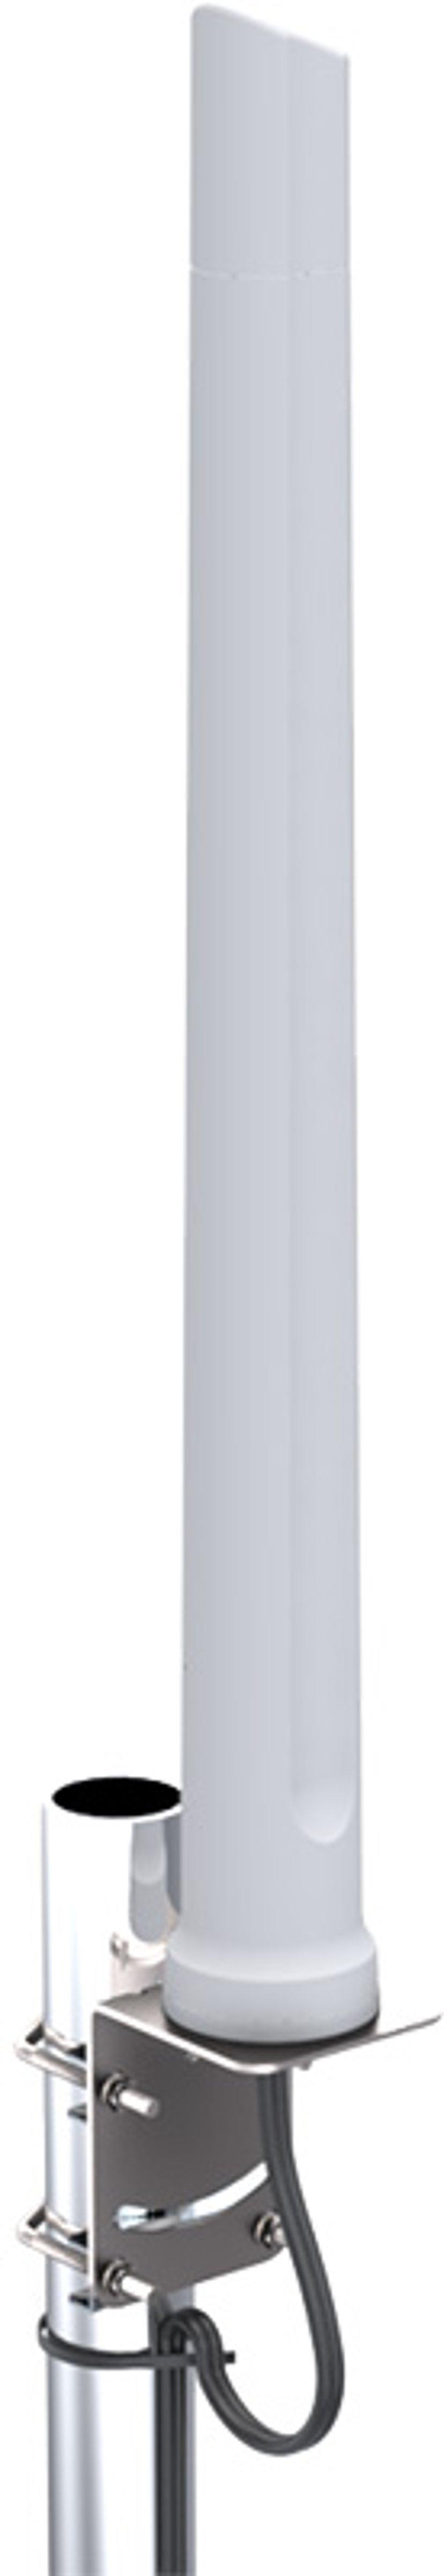 Poynting Omni-600-02 4G LTE Mimo 6Dbi